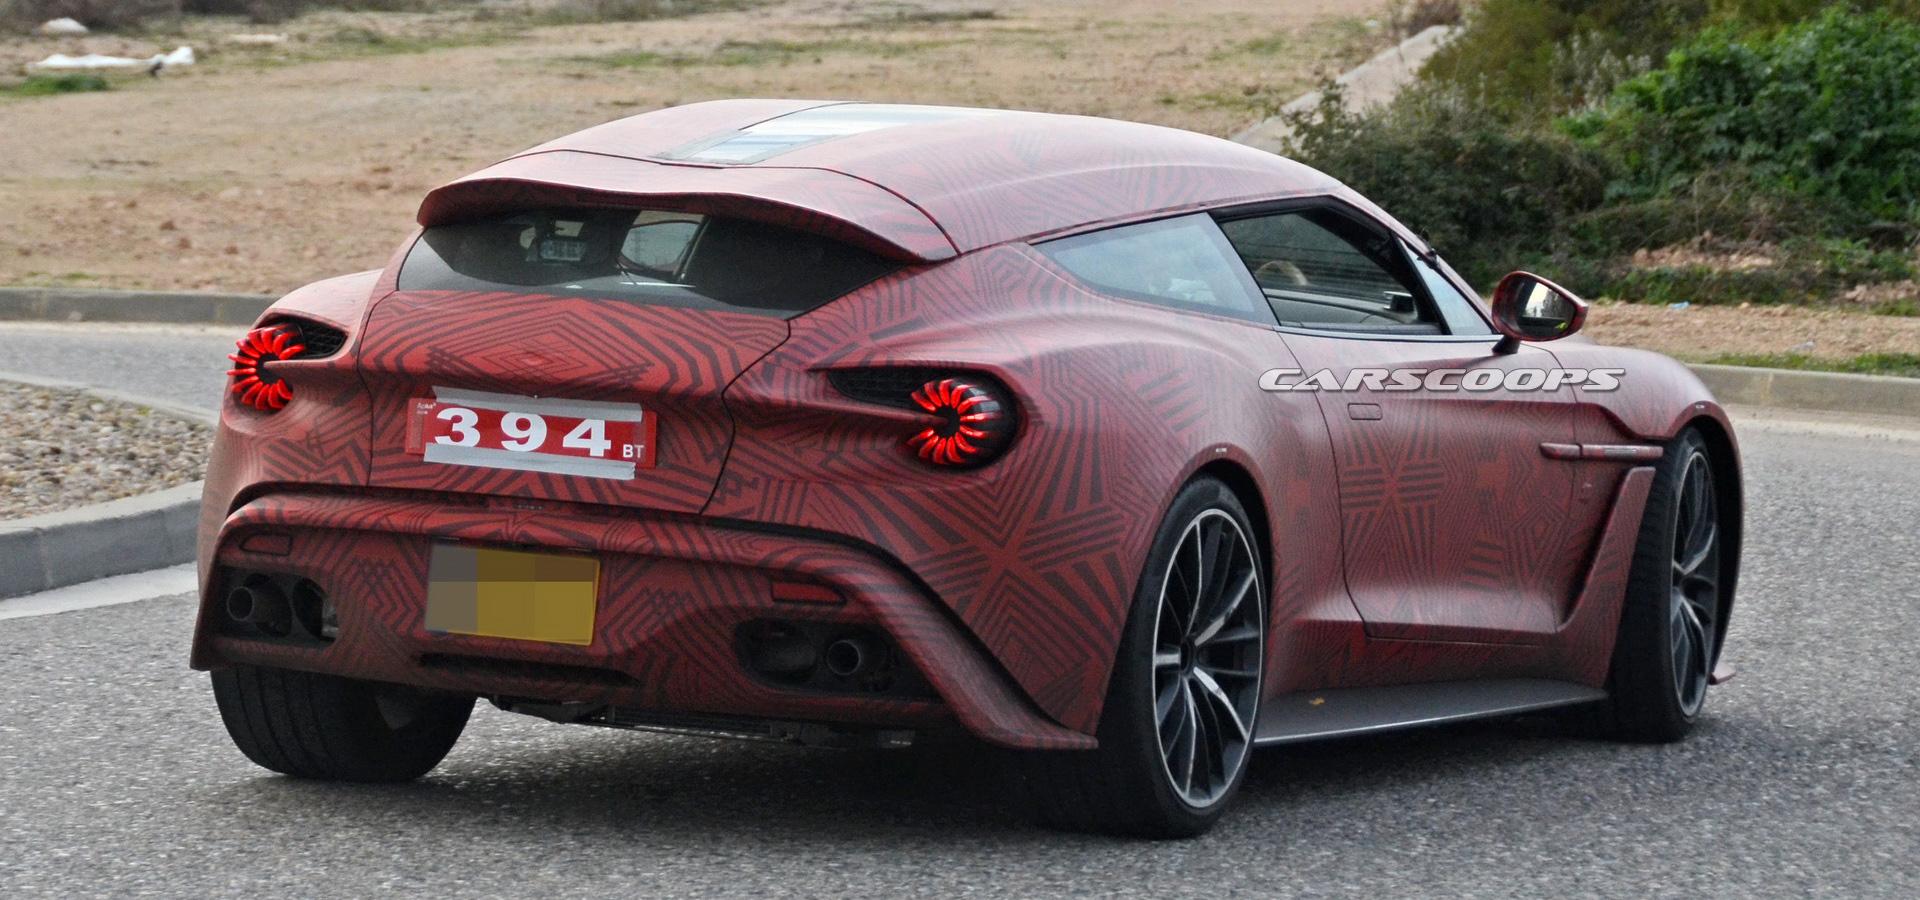 New Aston Martin Vanquish Zagato Shooting Brake Is Coming For